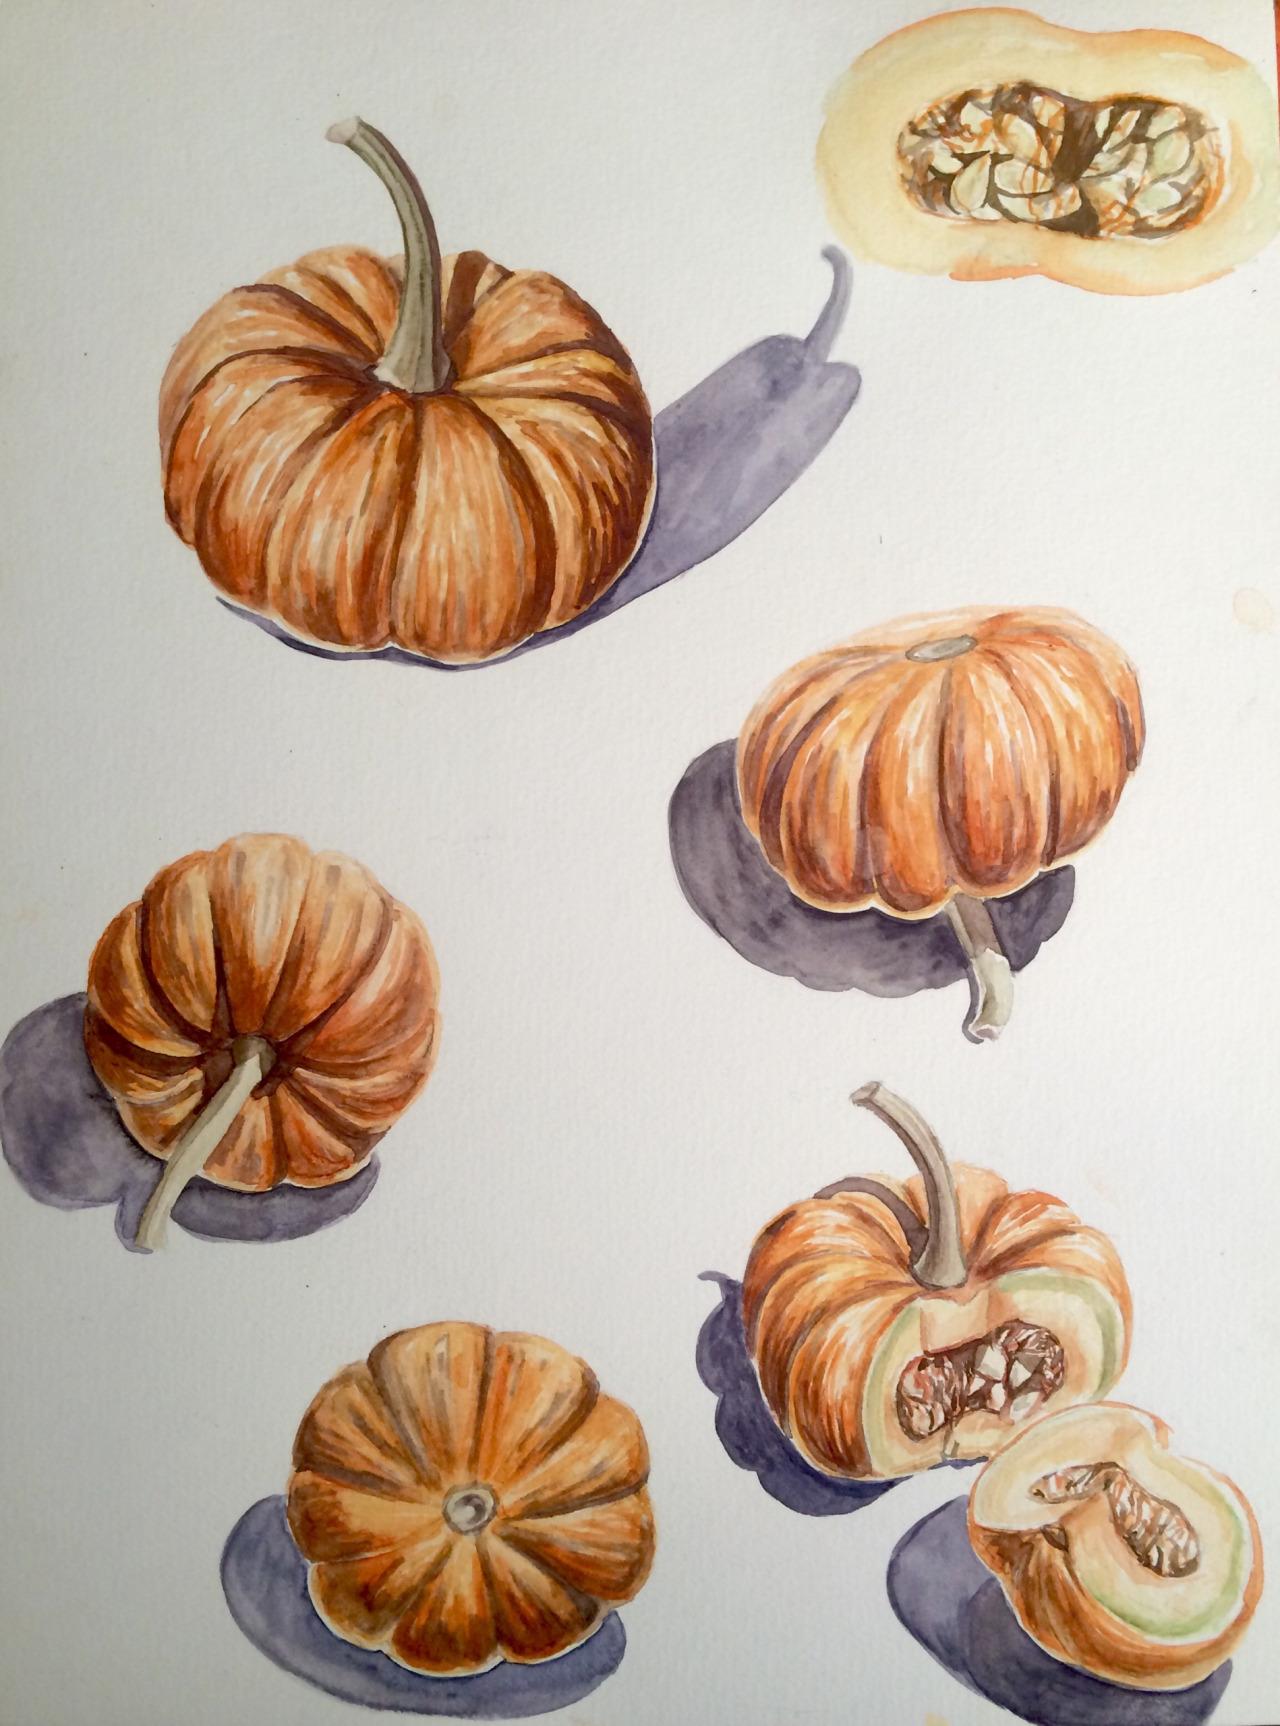 Pumpkin study   2016. Watercolor